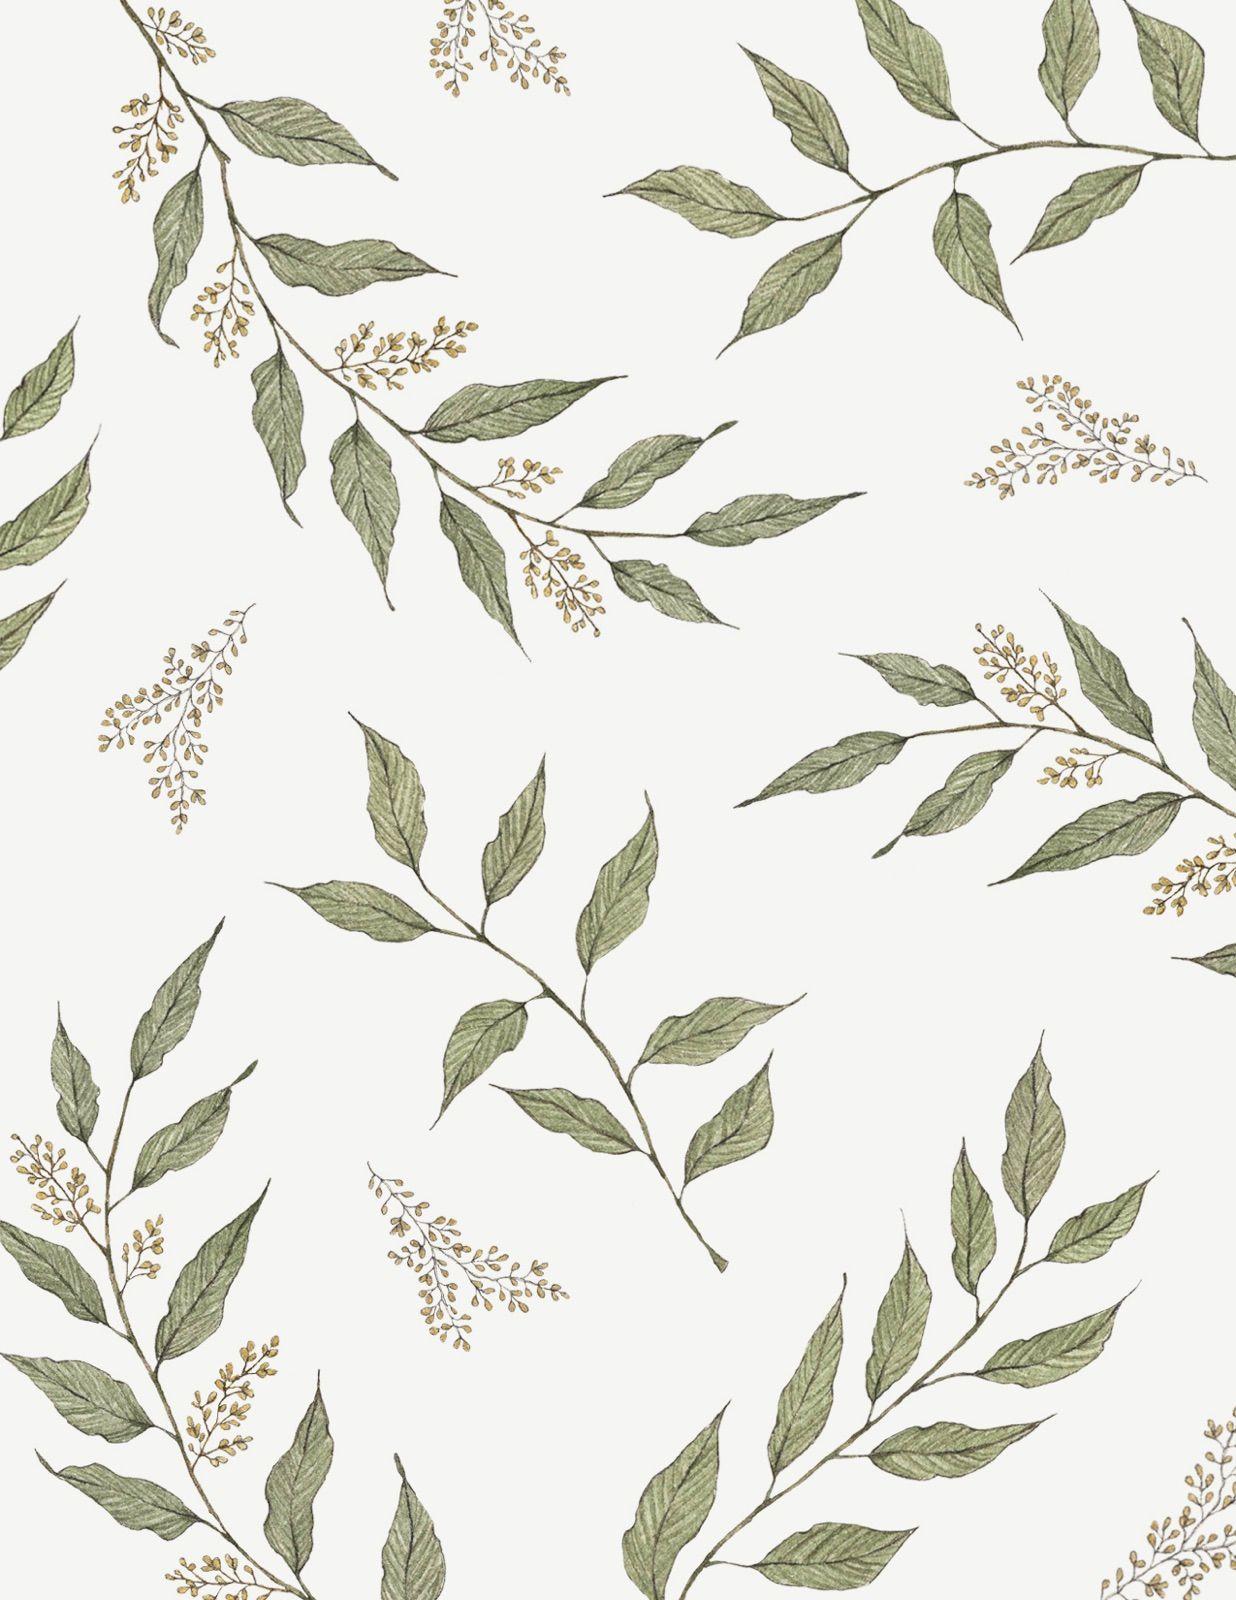 Finch & Fleur, paper goods, eucalyptus watercolor, eucalyptus pattern, botanical pattern